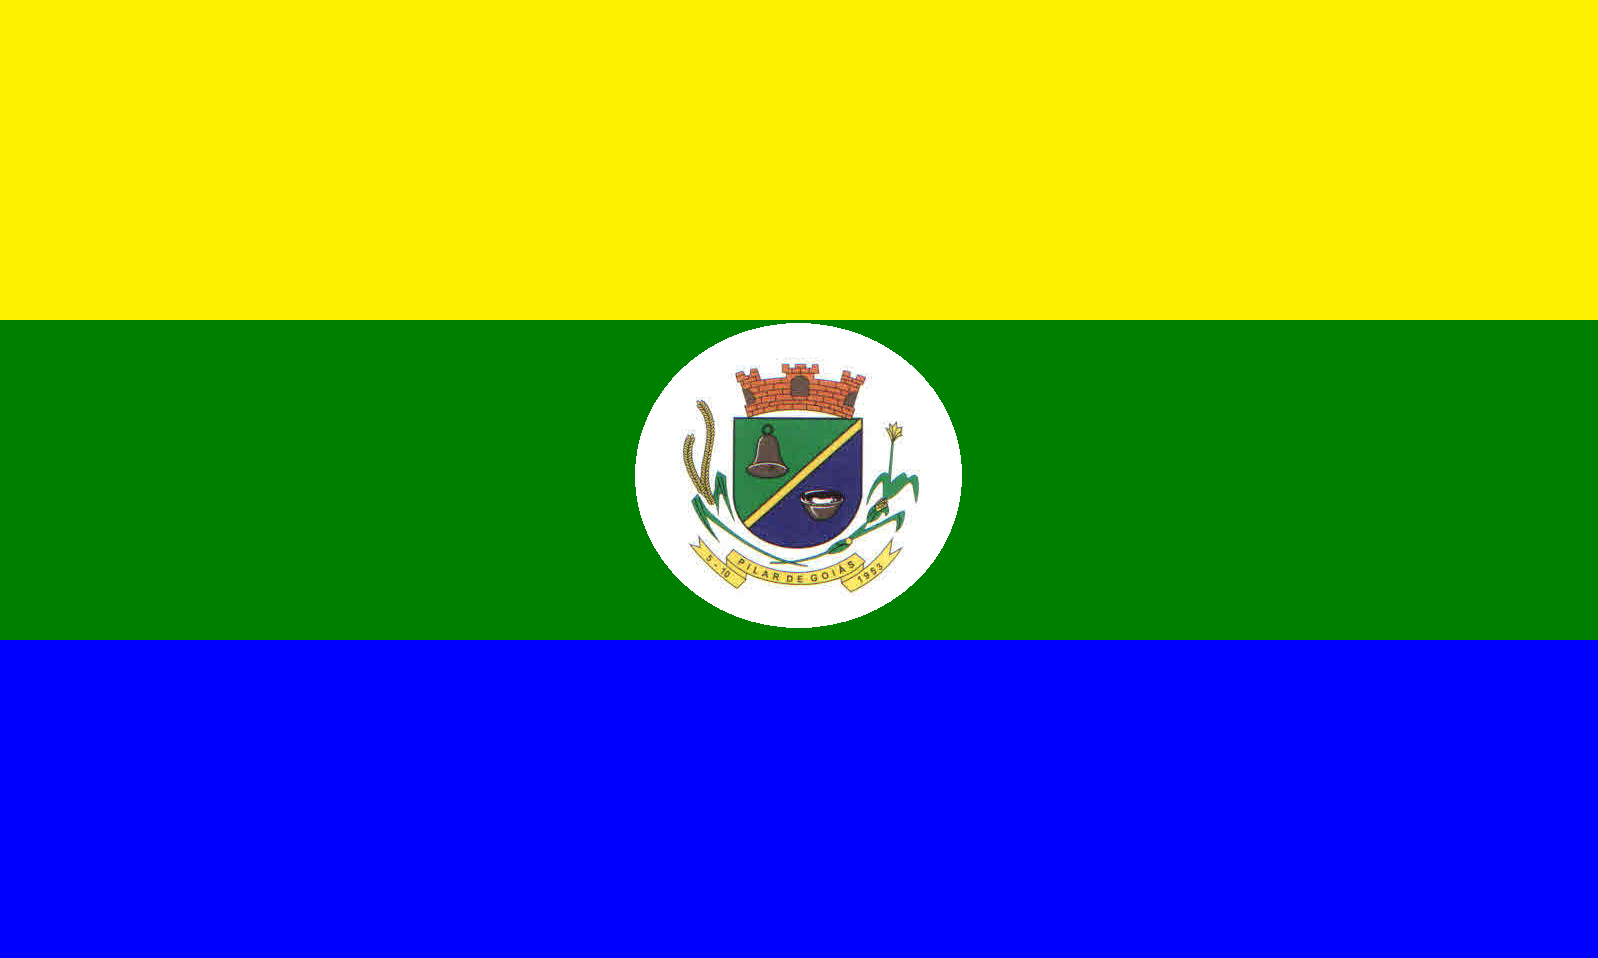 SEBRAE Pilar de Goiás 2021